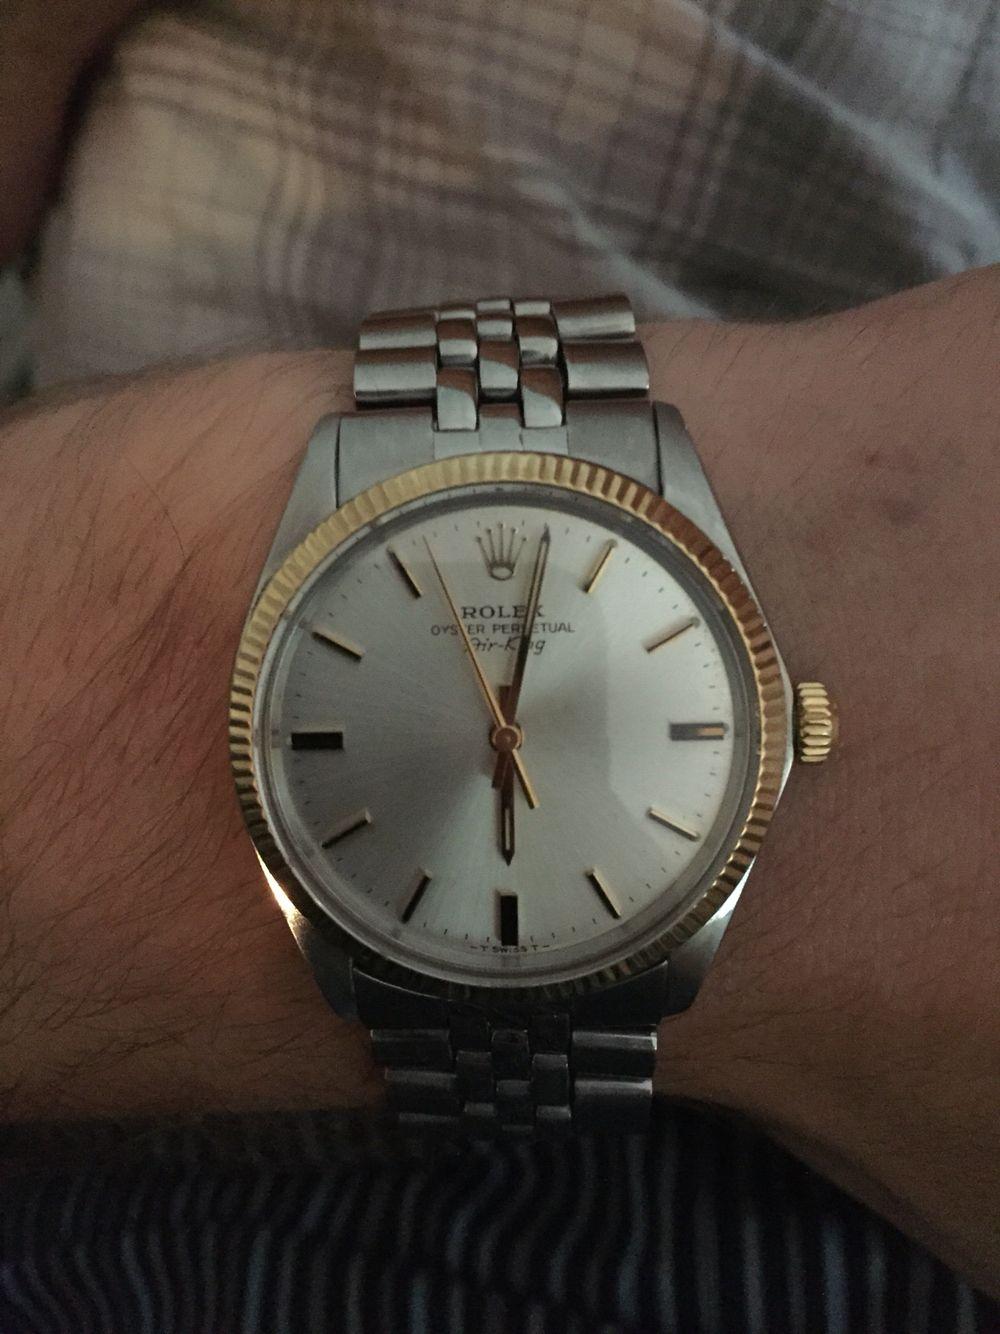 Rolex Air King 5500 Rolex air king, Rolex, Gold watch